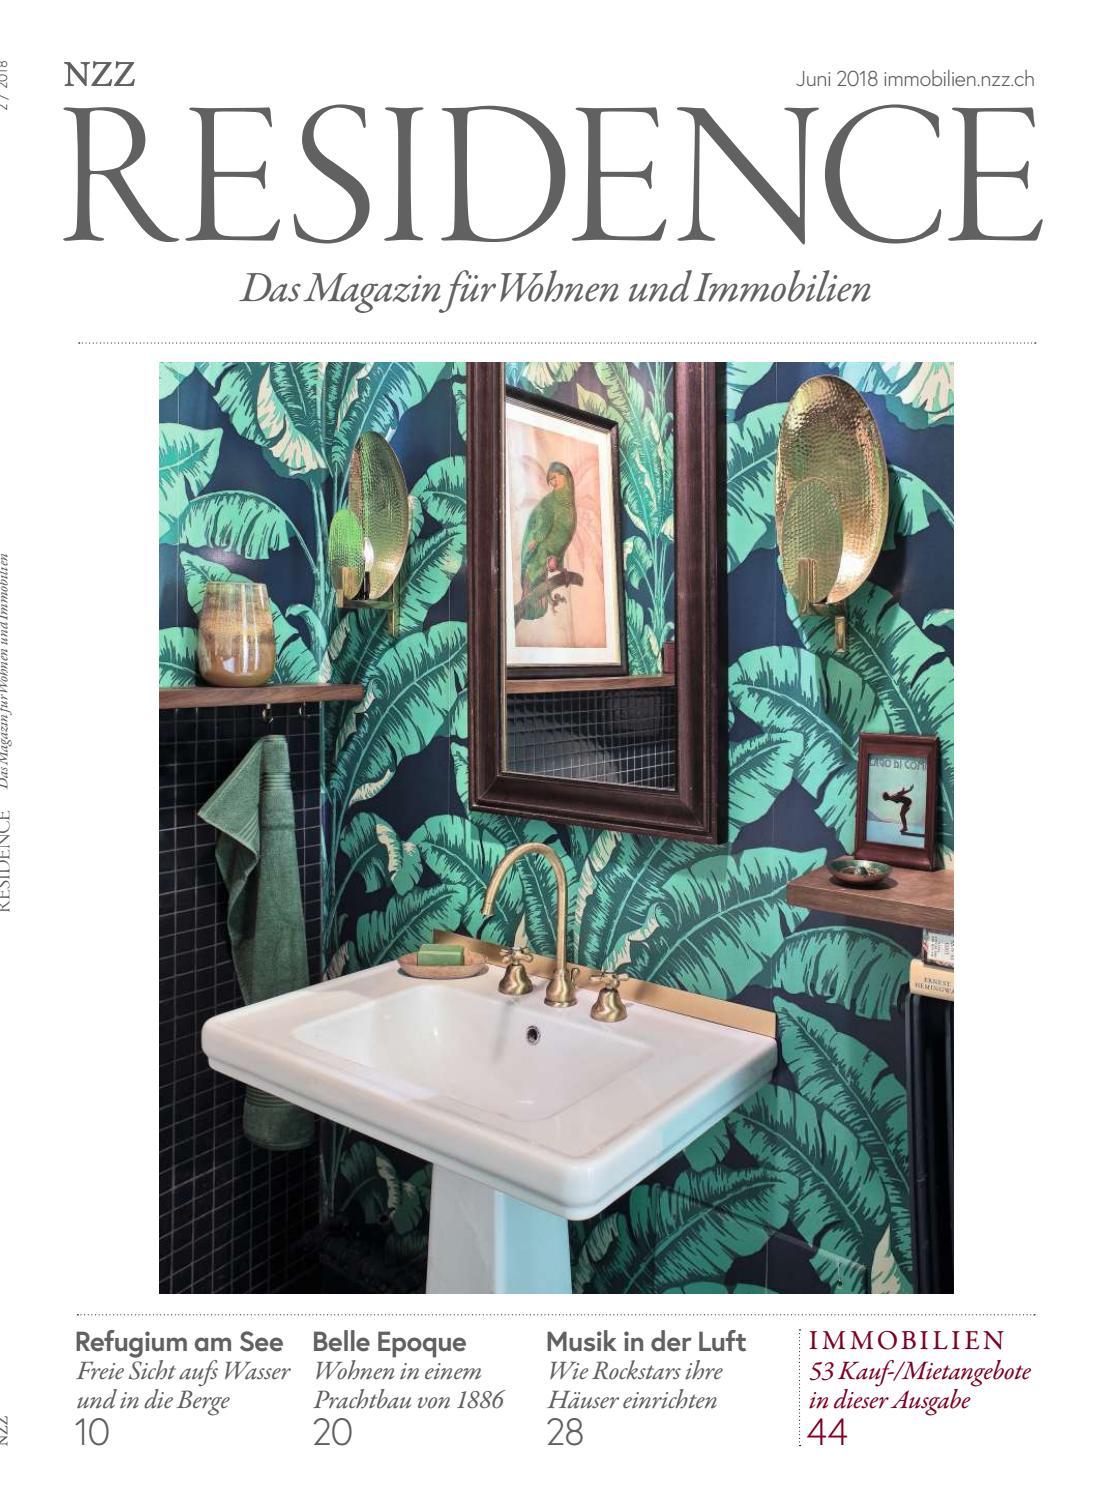 Residence Juni 2018 By NZZ Residence   Issuu